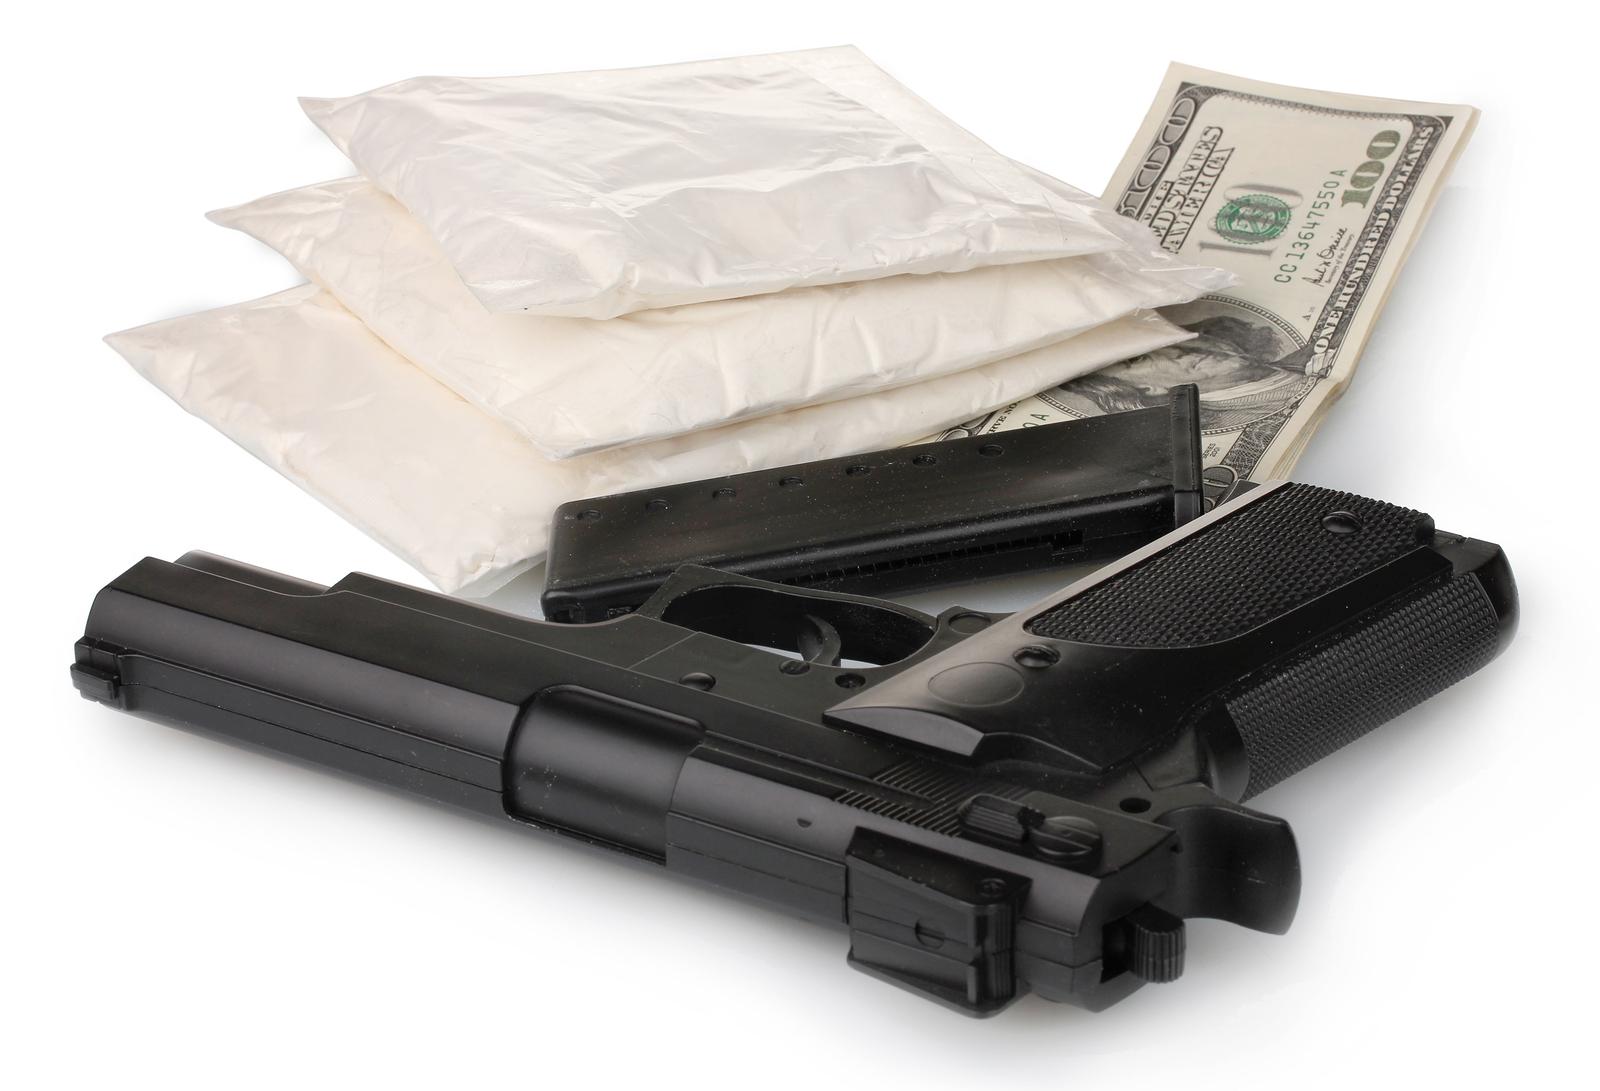 Guns Cars Drugs And Money